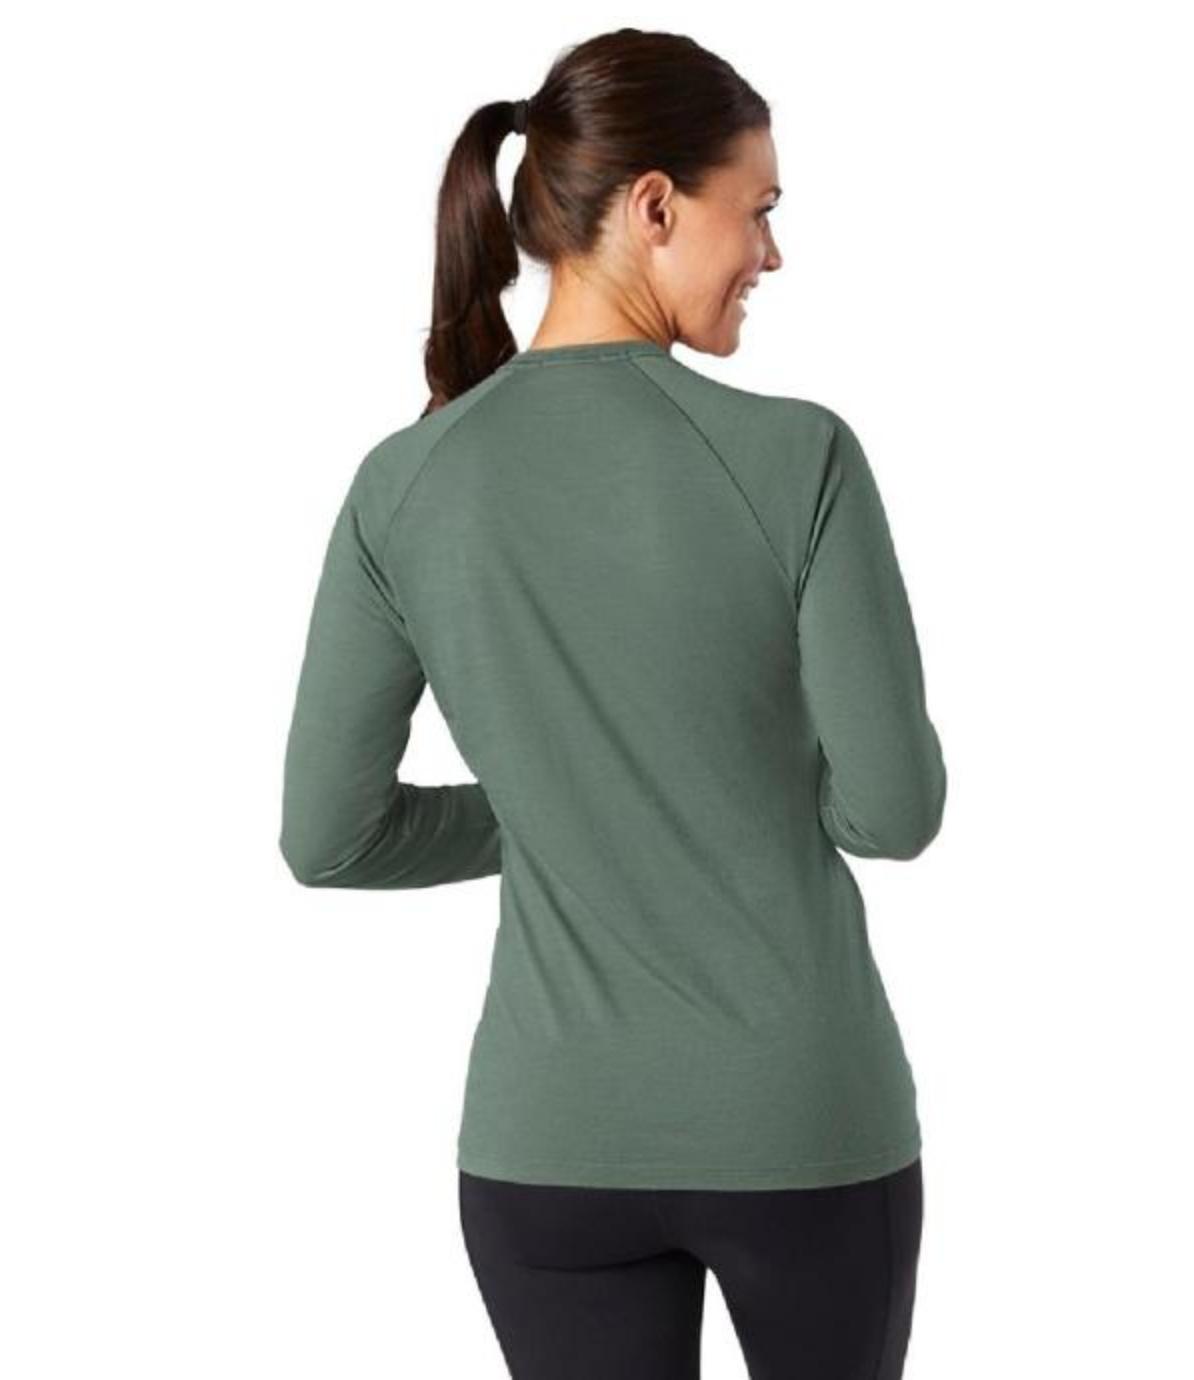 Women's Merino 150 Baselayer Long Sleeve-2